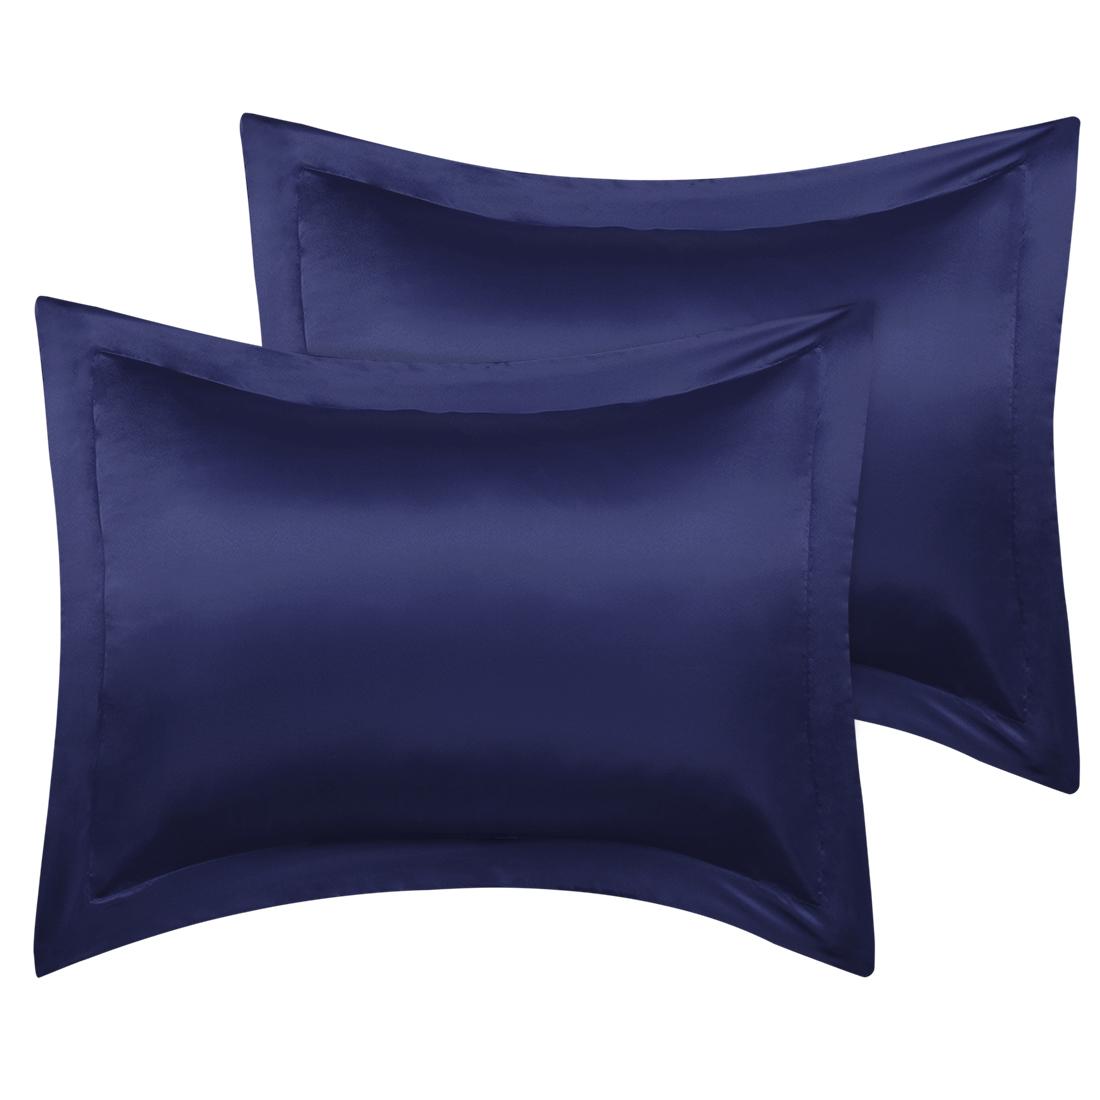 2 Pcs Navy Pillow Shams Satin Pillow Cases King Oxford Pillowcases